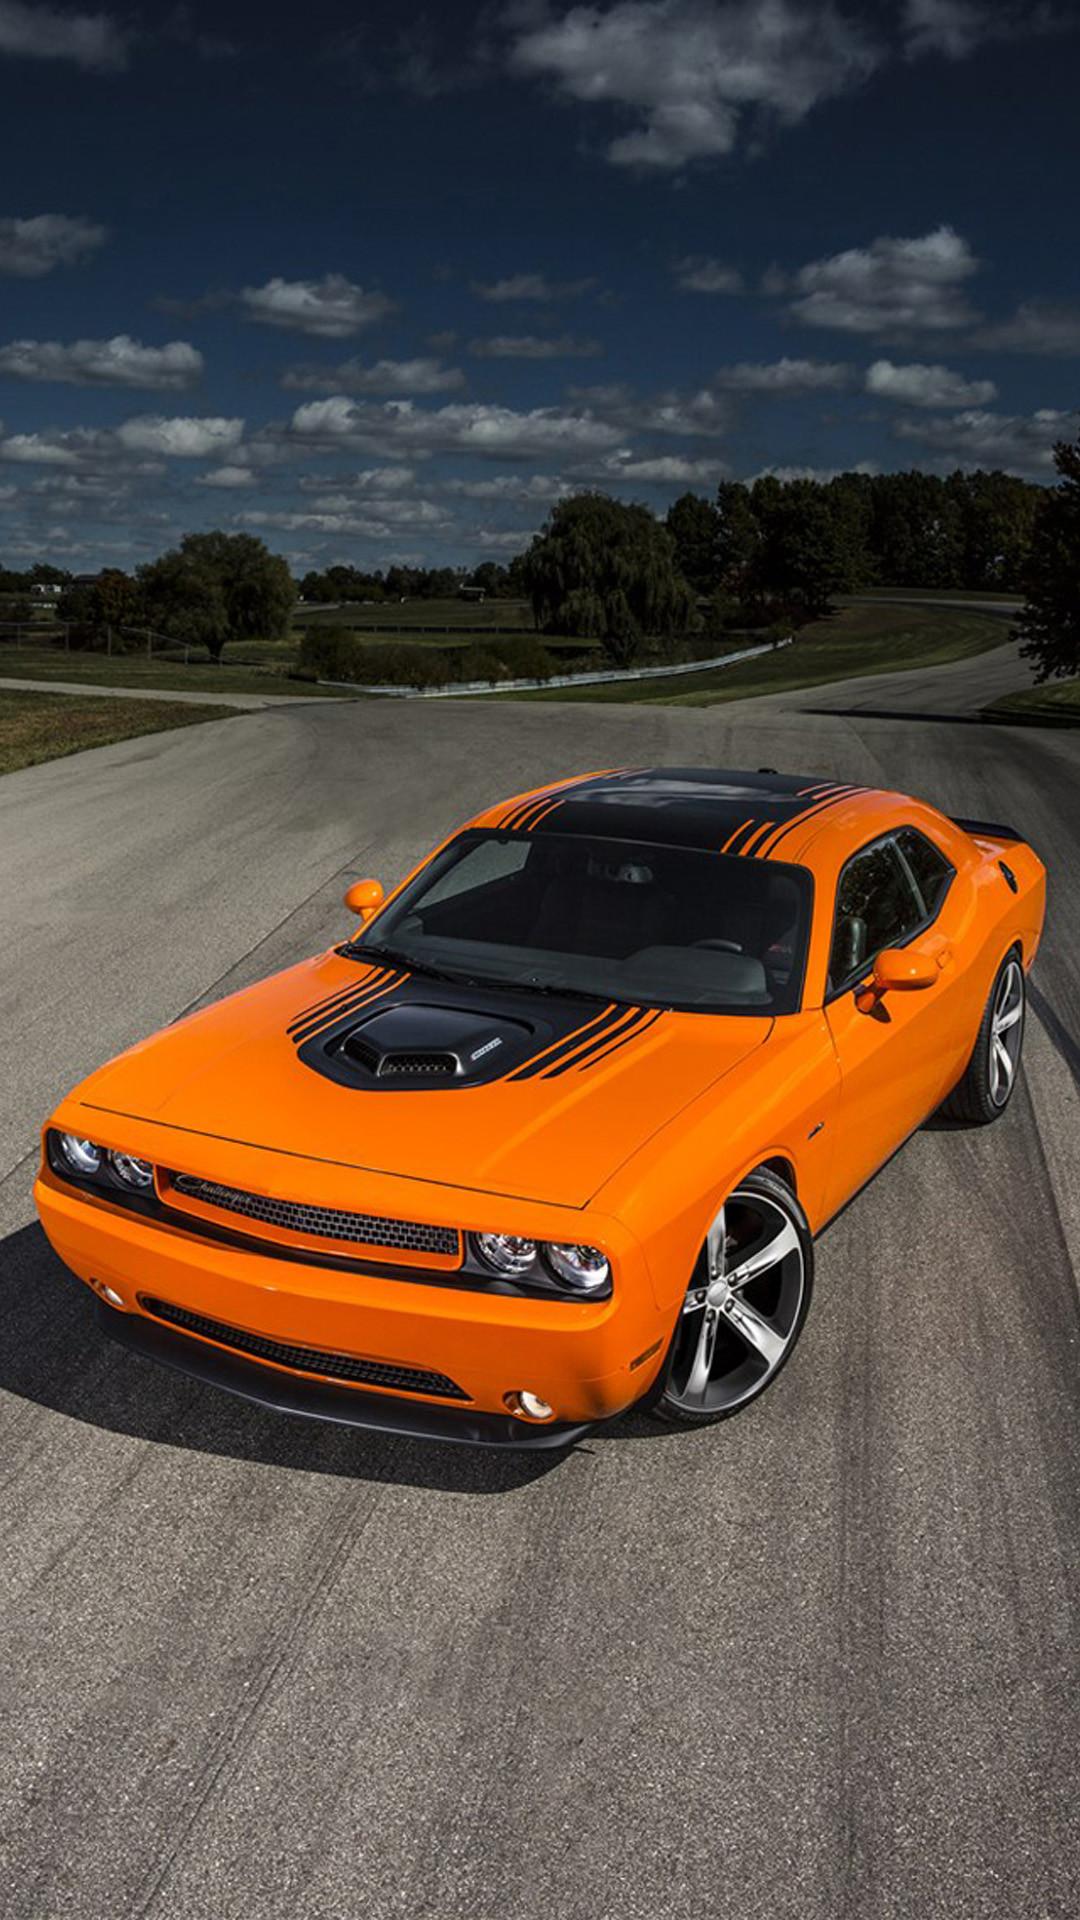 Dodge Challenger iPhone Wallpaper (86+ images)